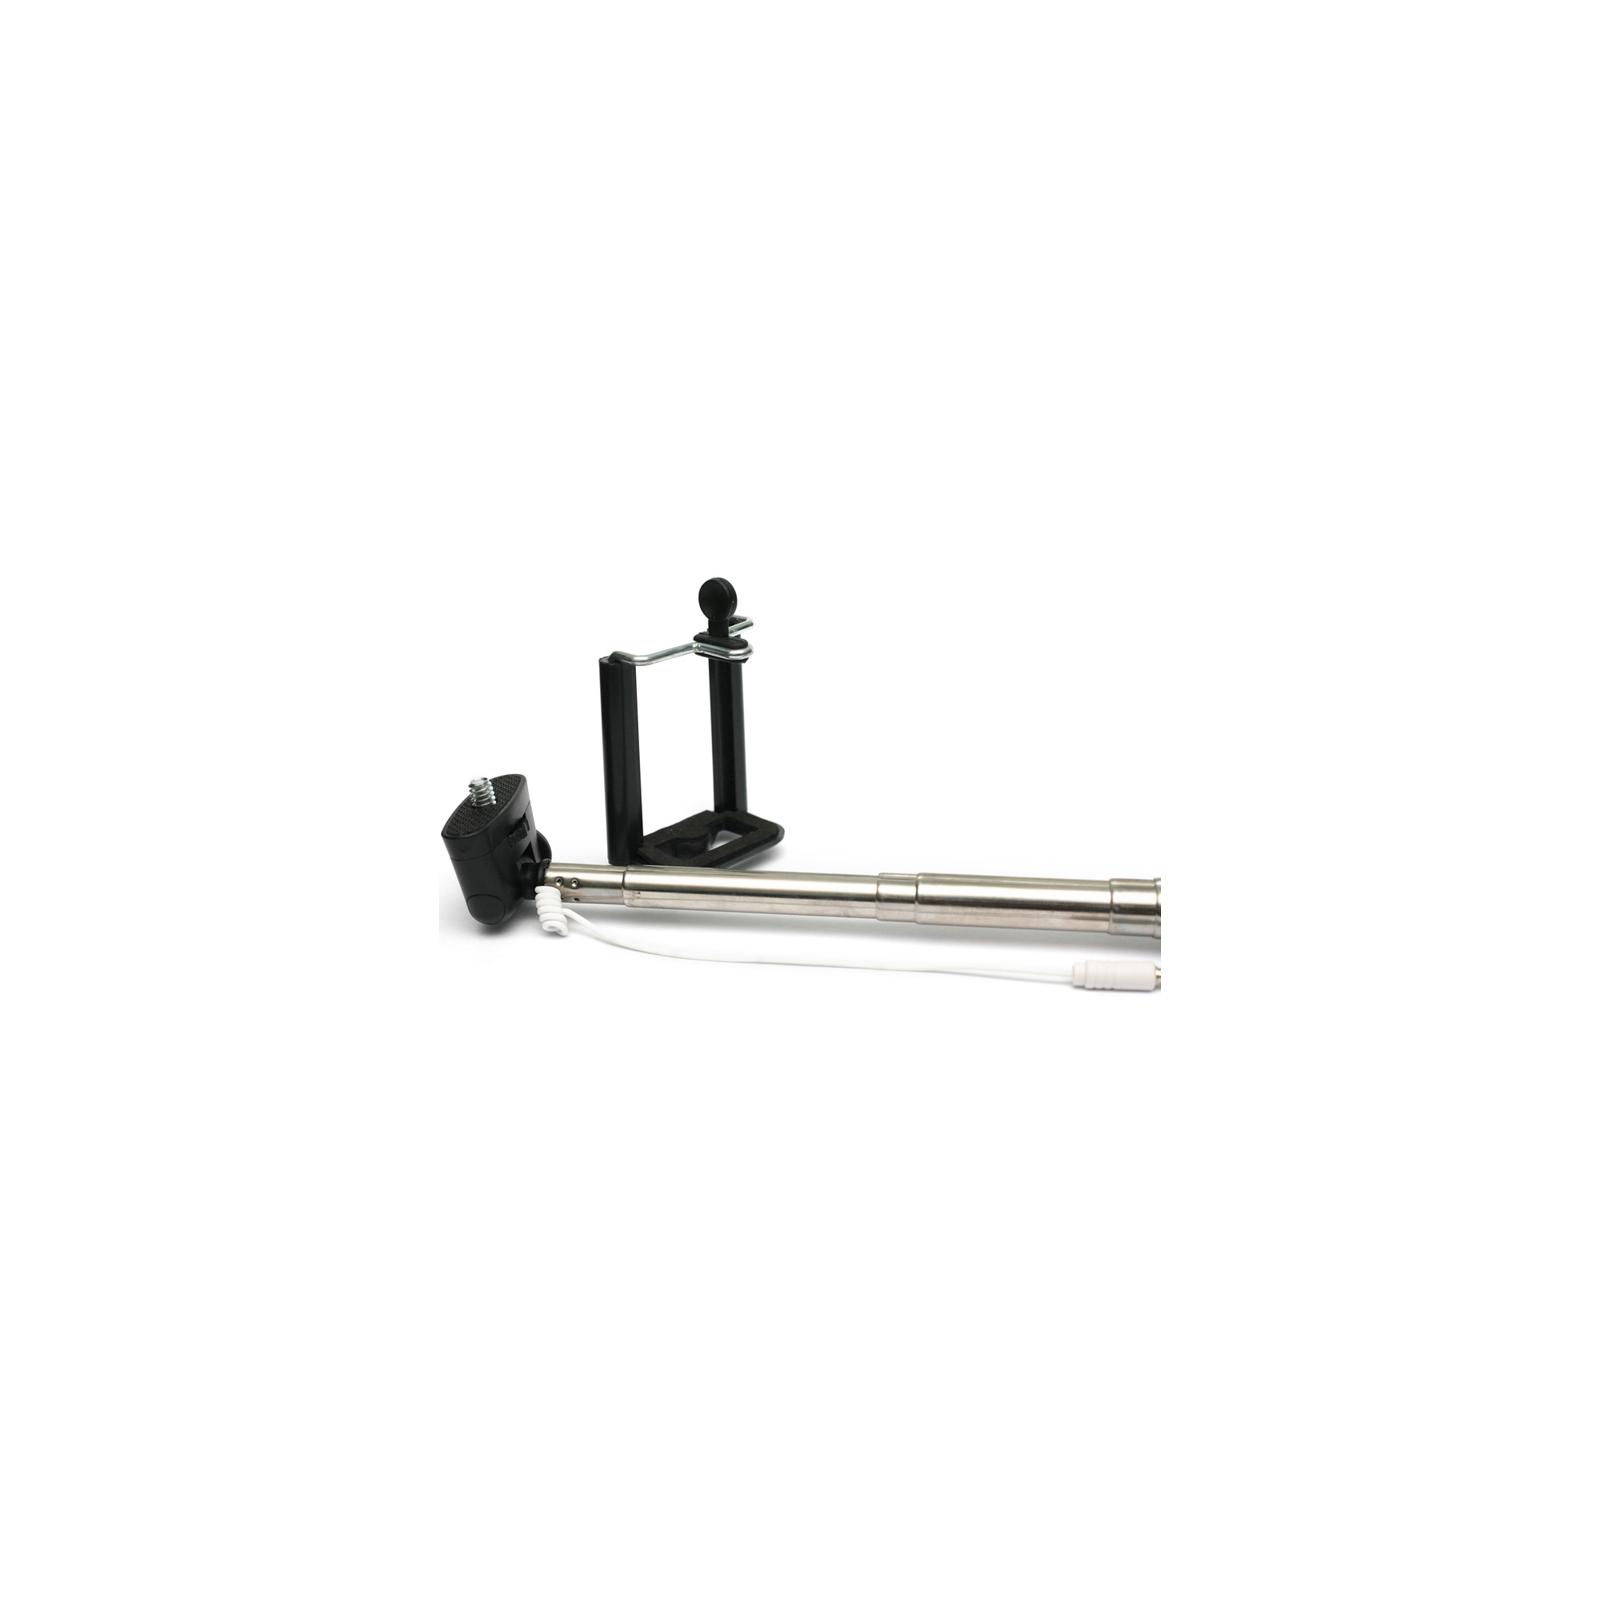 Монопод для селфи Selfi Monopod ISM-03C со шнуром AUX PowerPlant (ISM03C) изображение 3